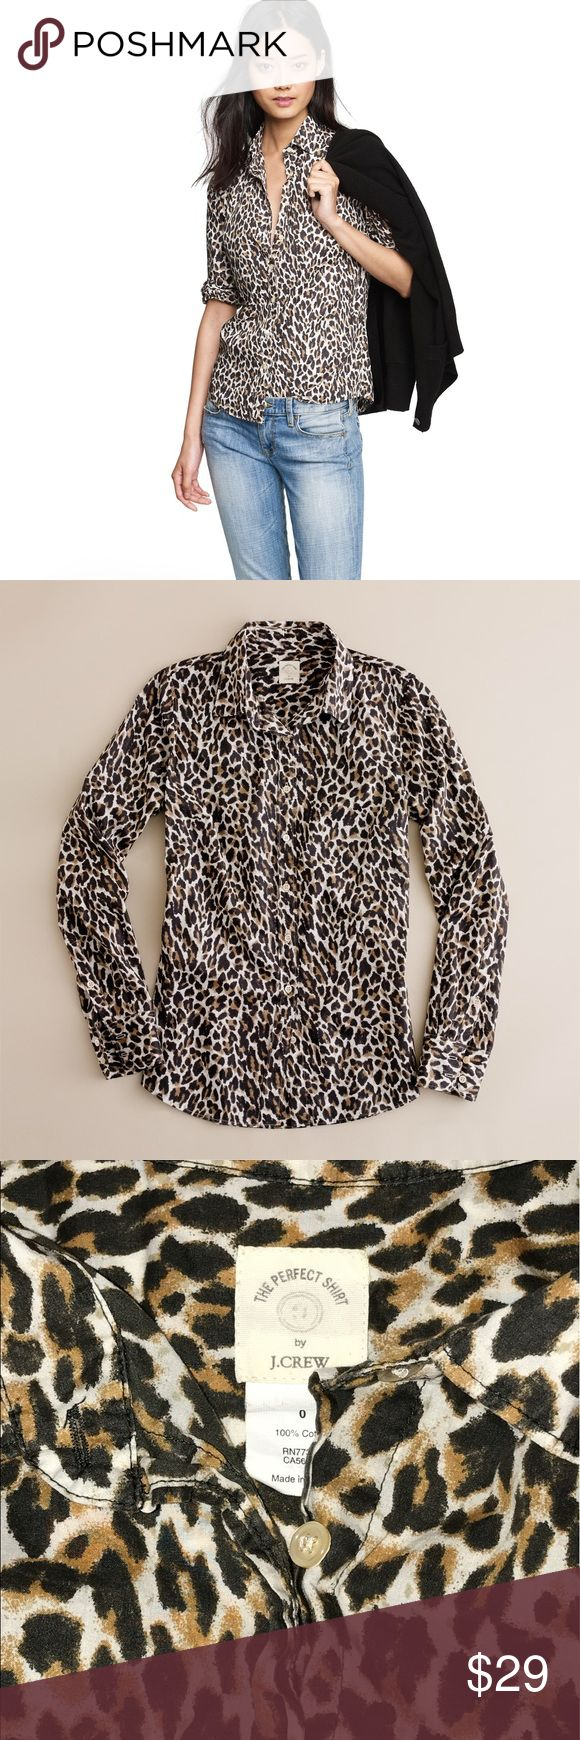 J. Crew The Perfect Shirt cheetah print Sz. 0 EUC J. Crew The Perfect Shirt cheetah print Sz. 0 EUC J. Crew Tops